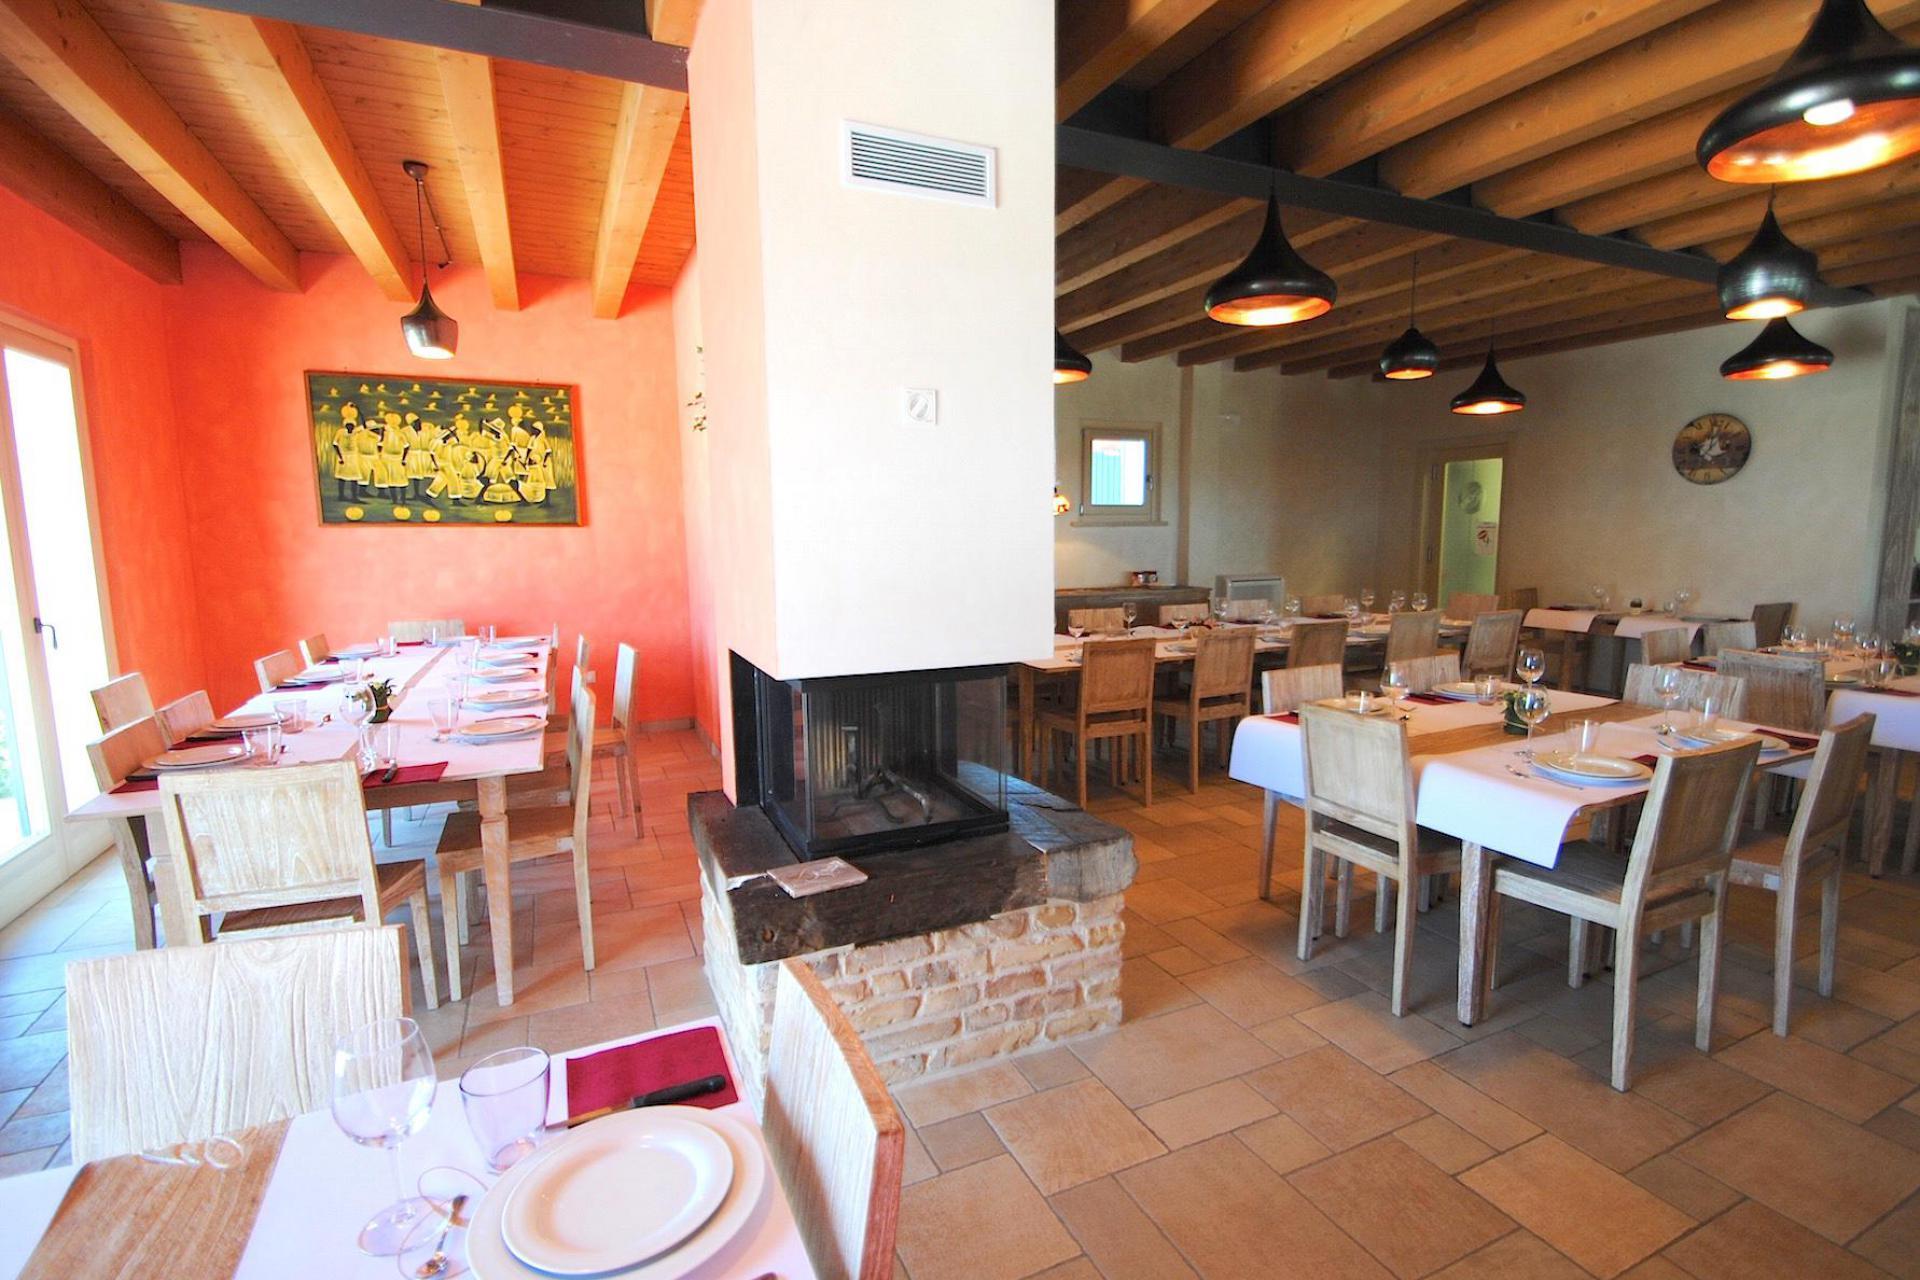 Agriturismo Le Marche Mooie agriturismo in Marche met restaurant